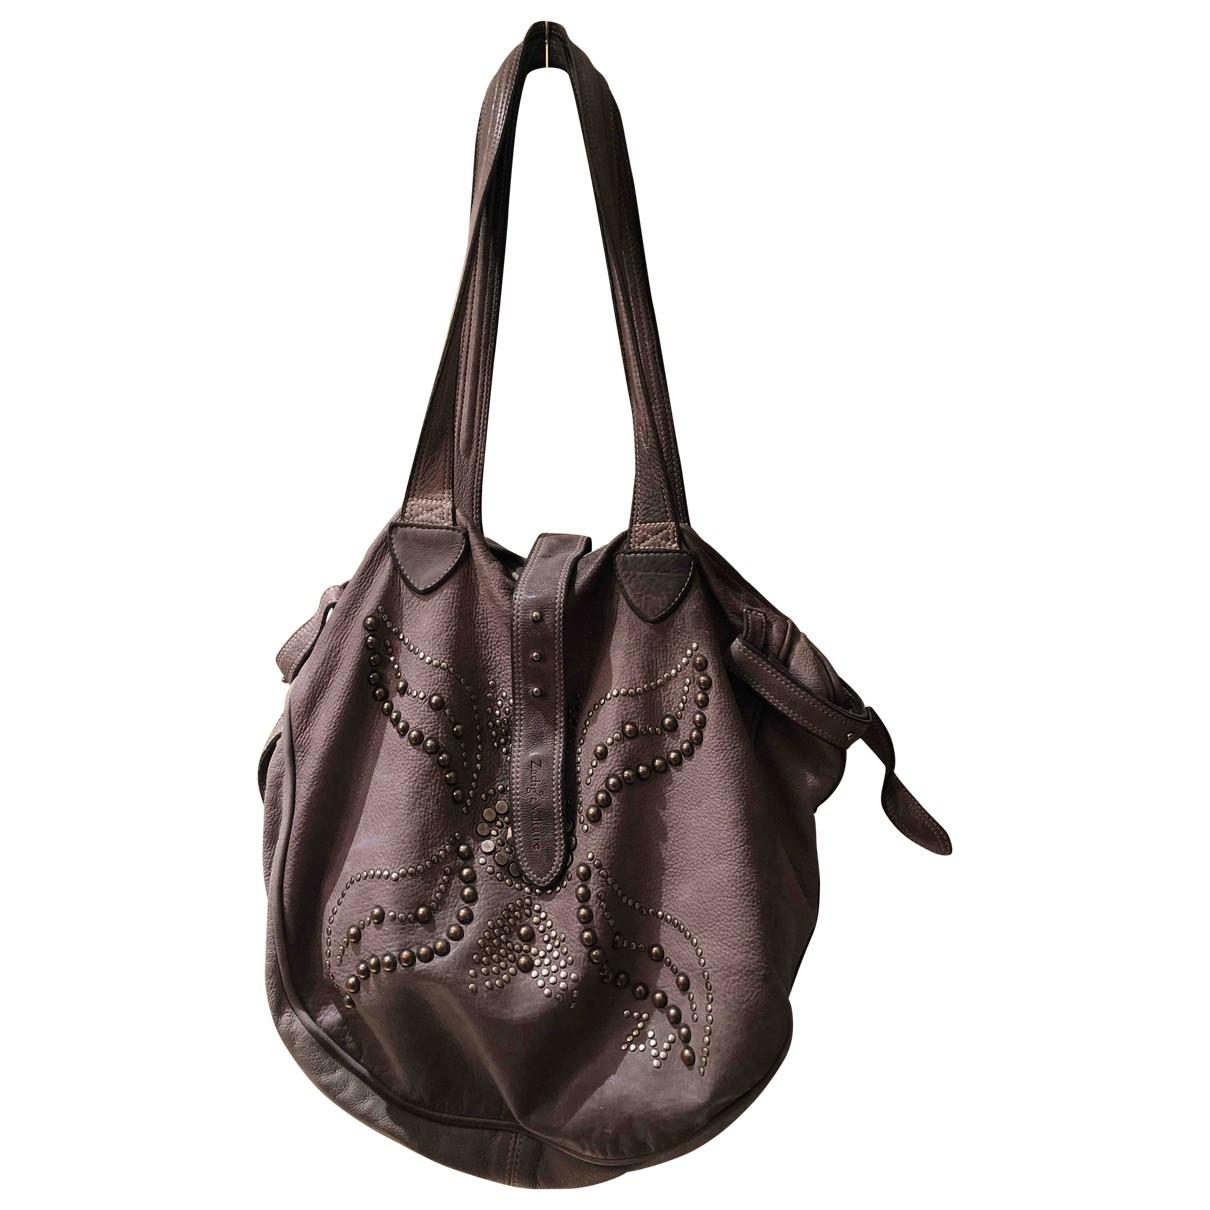 Zadig & Voltaire \N Purple Leather handbag for Women \N